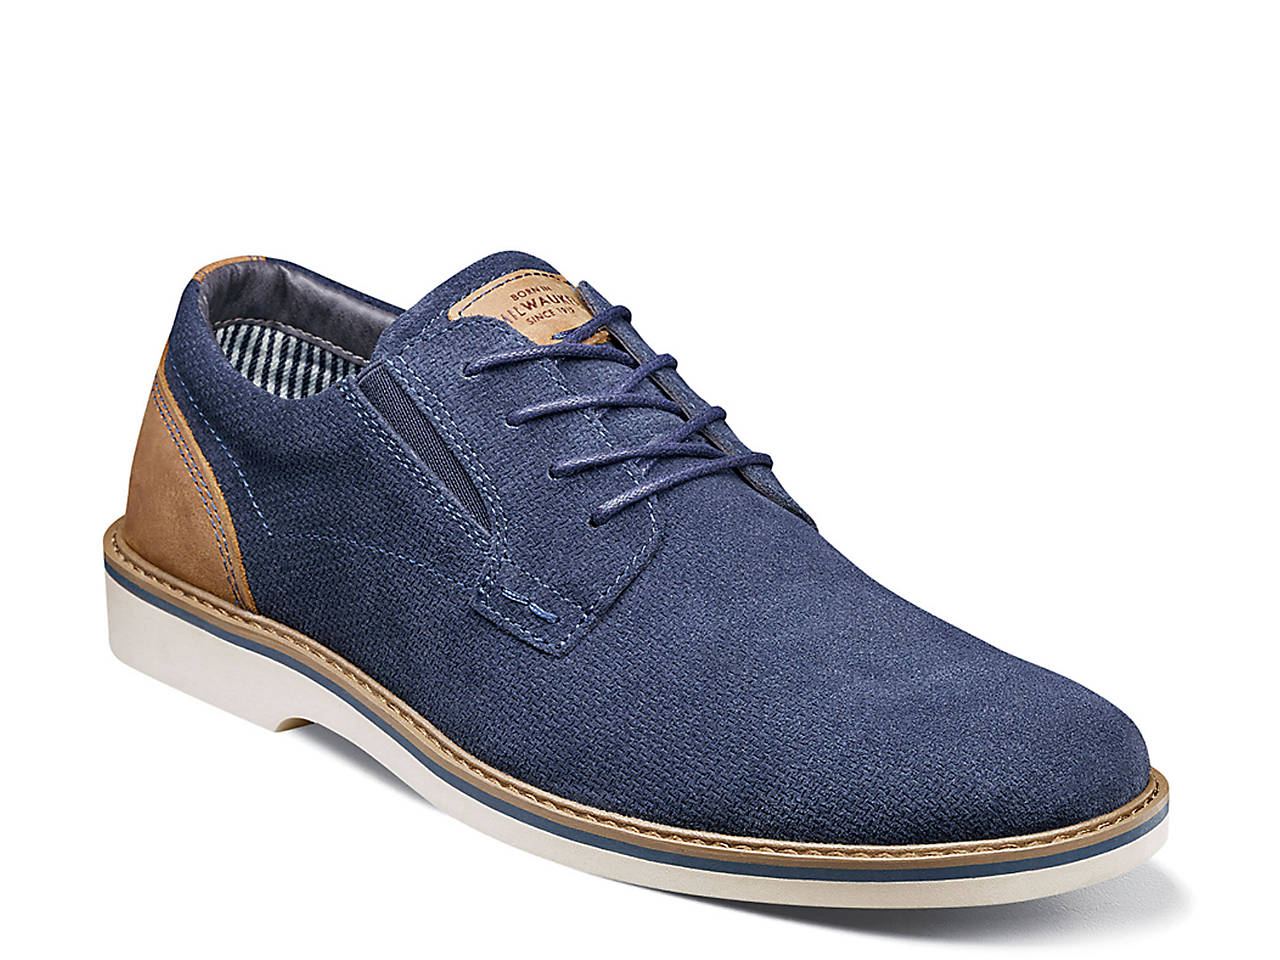 6b270a45590a Nunn Bush Barklay Oxford Men s Shoes